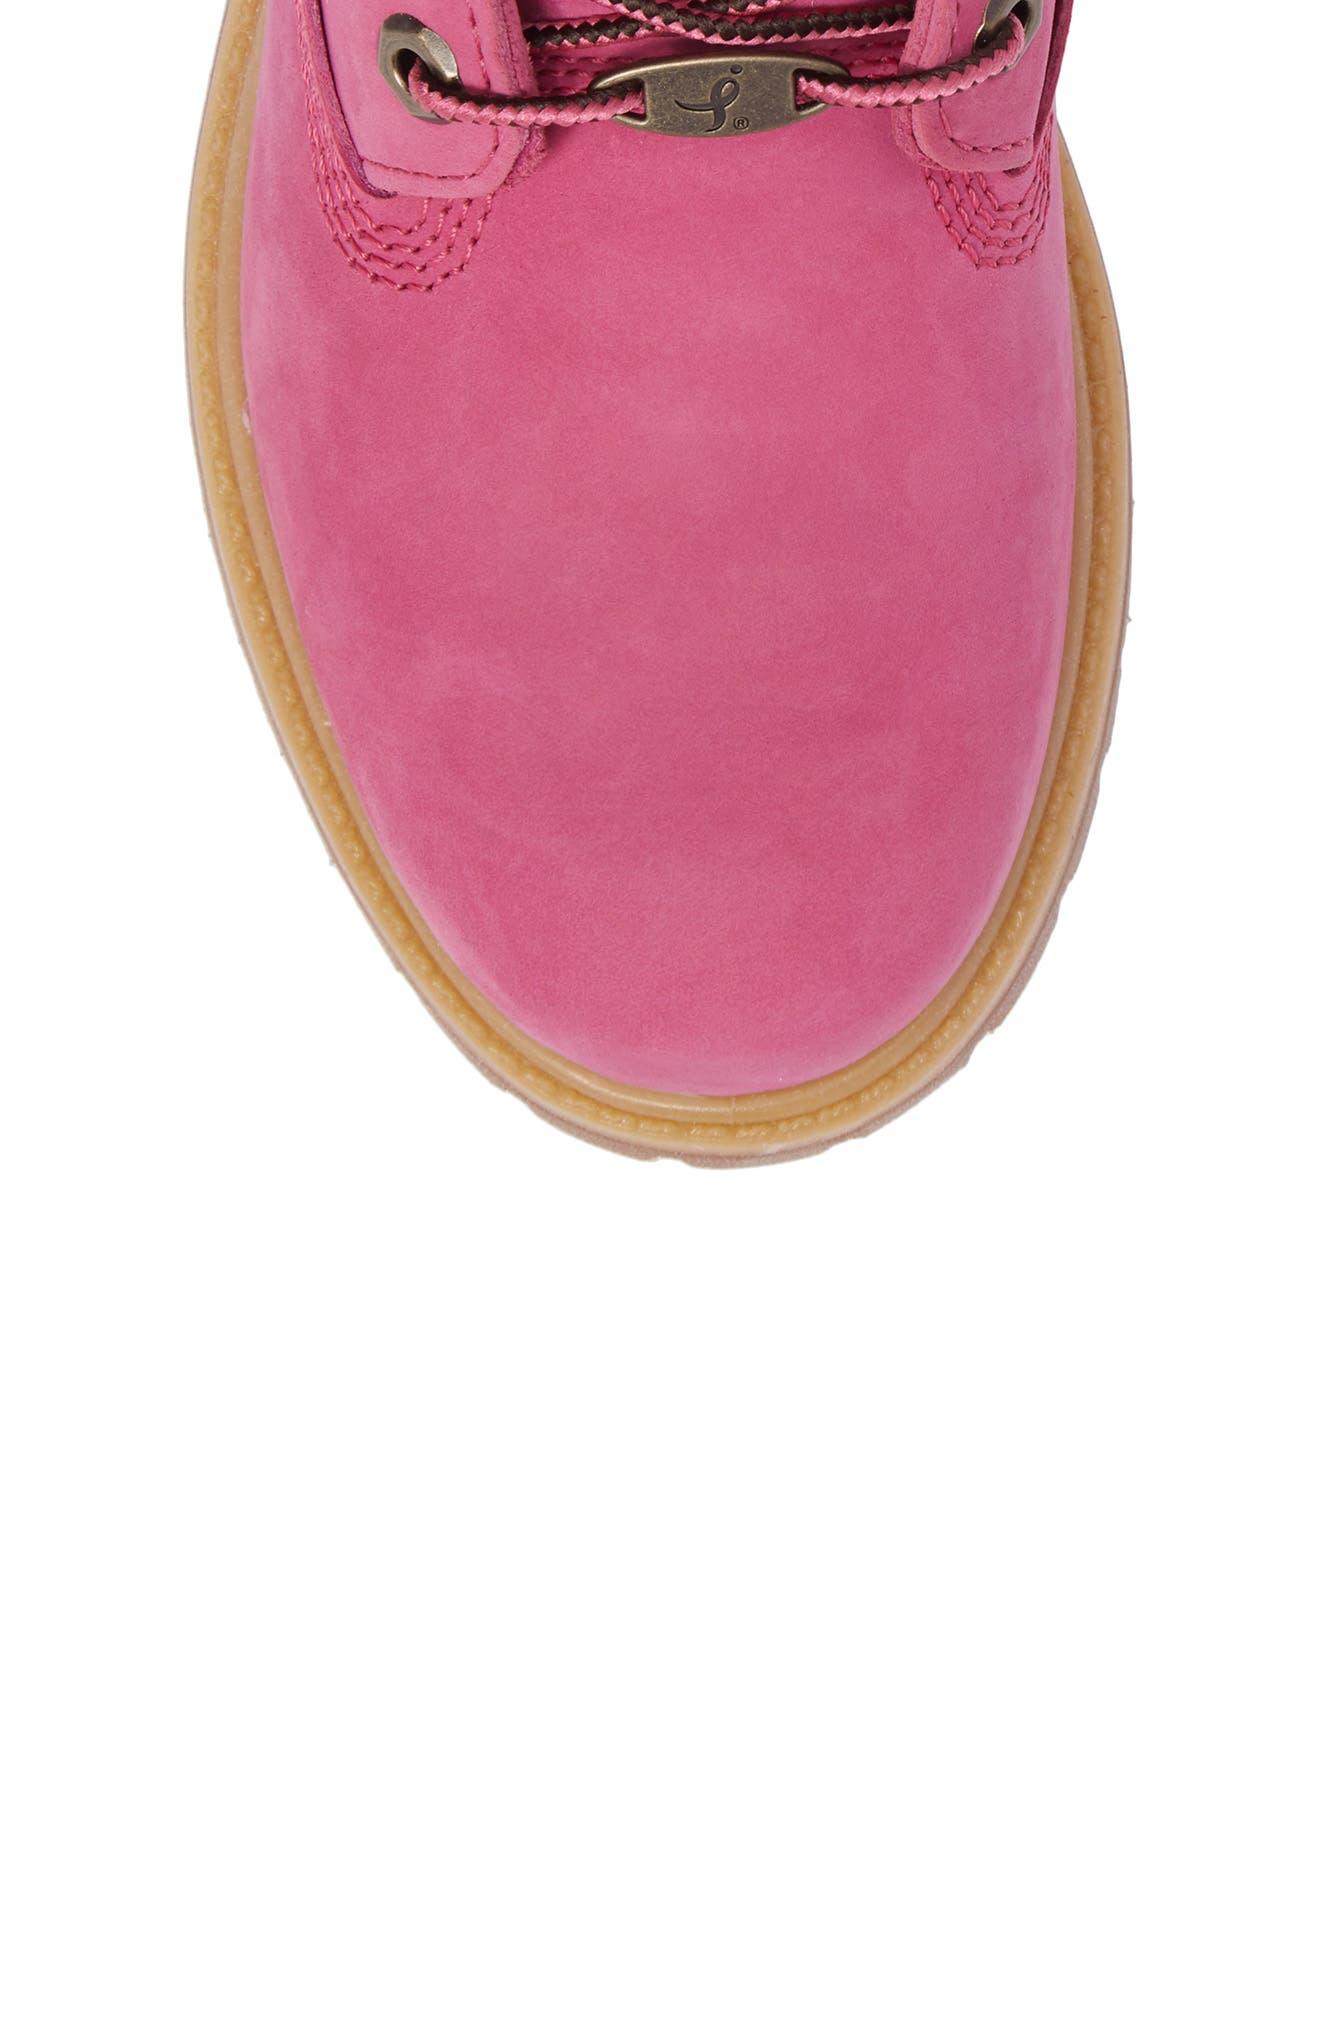 x Susan G. Komen 6-Inch Waterproof Insulated Boot,                             Alternate thumbnail 5, color,                             Bright Pink Nubuck